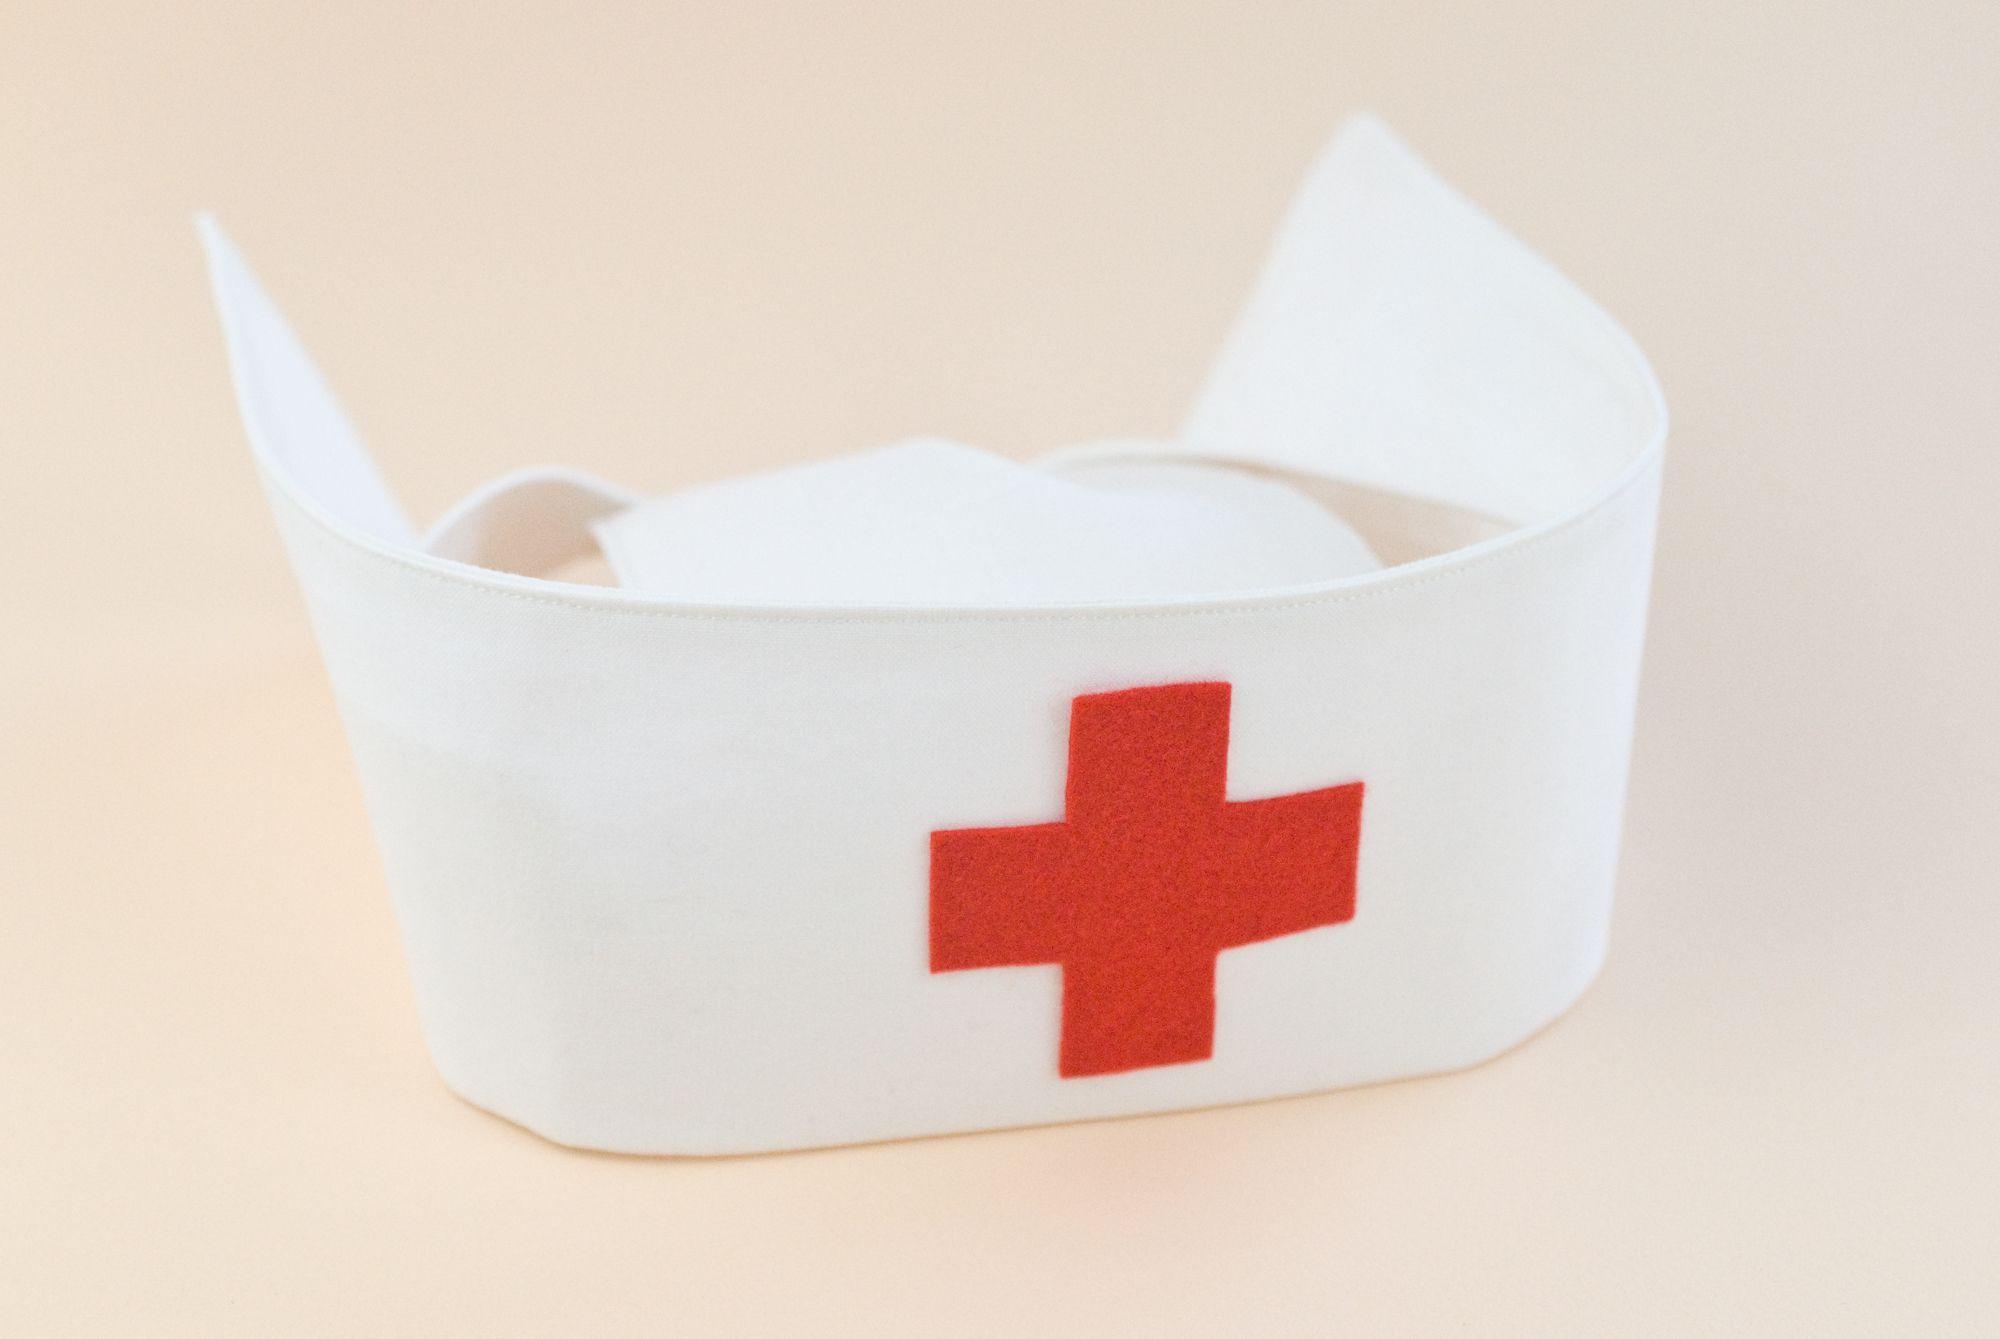 How To Make A Nurse S Hat Hat Patterns To Sew Nurse Hat Diy Nurse Costume